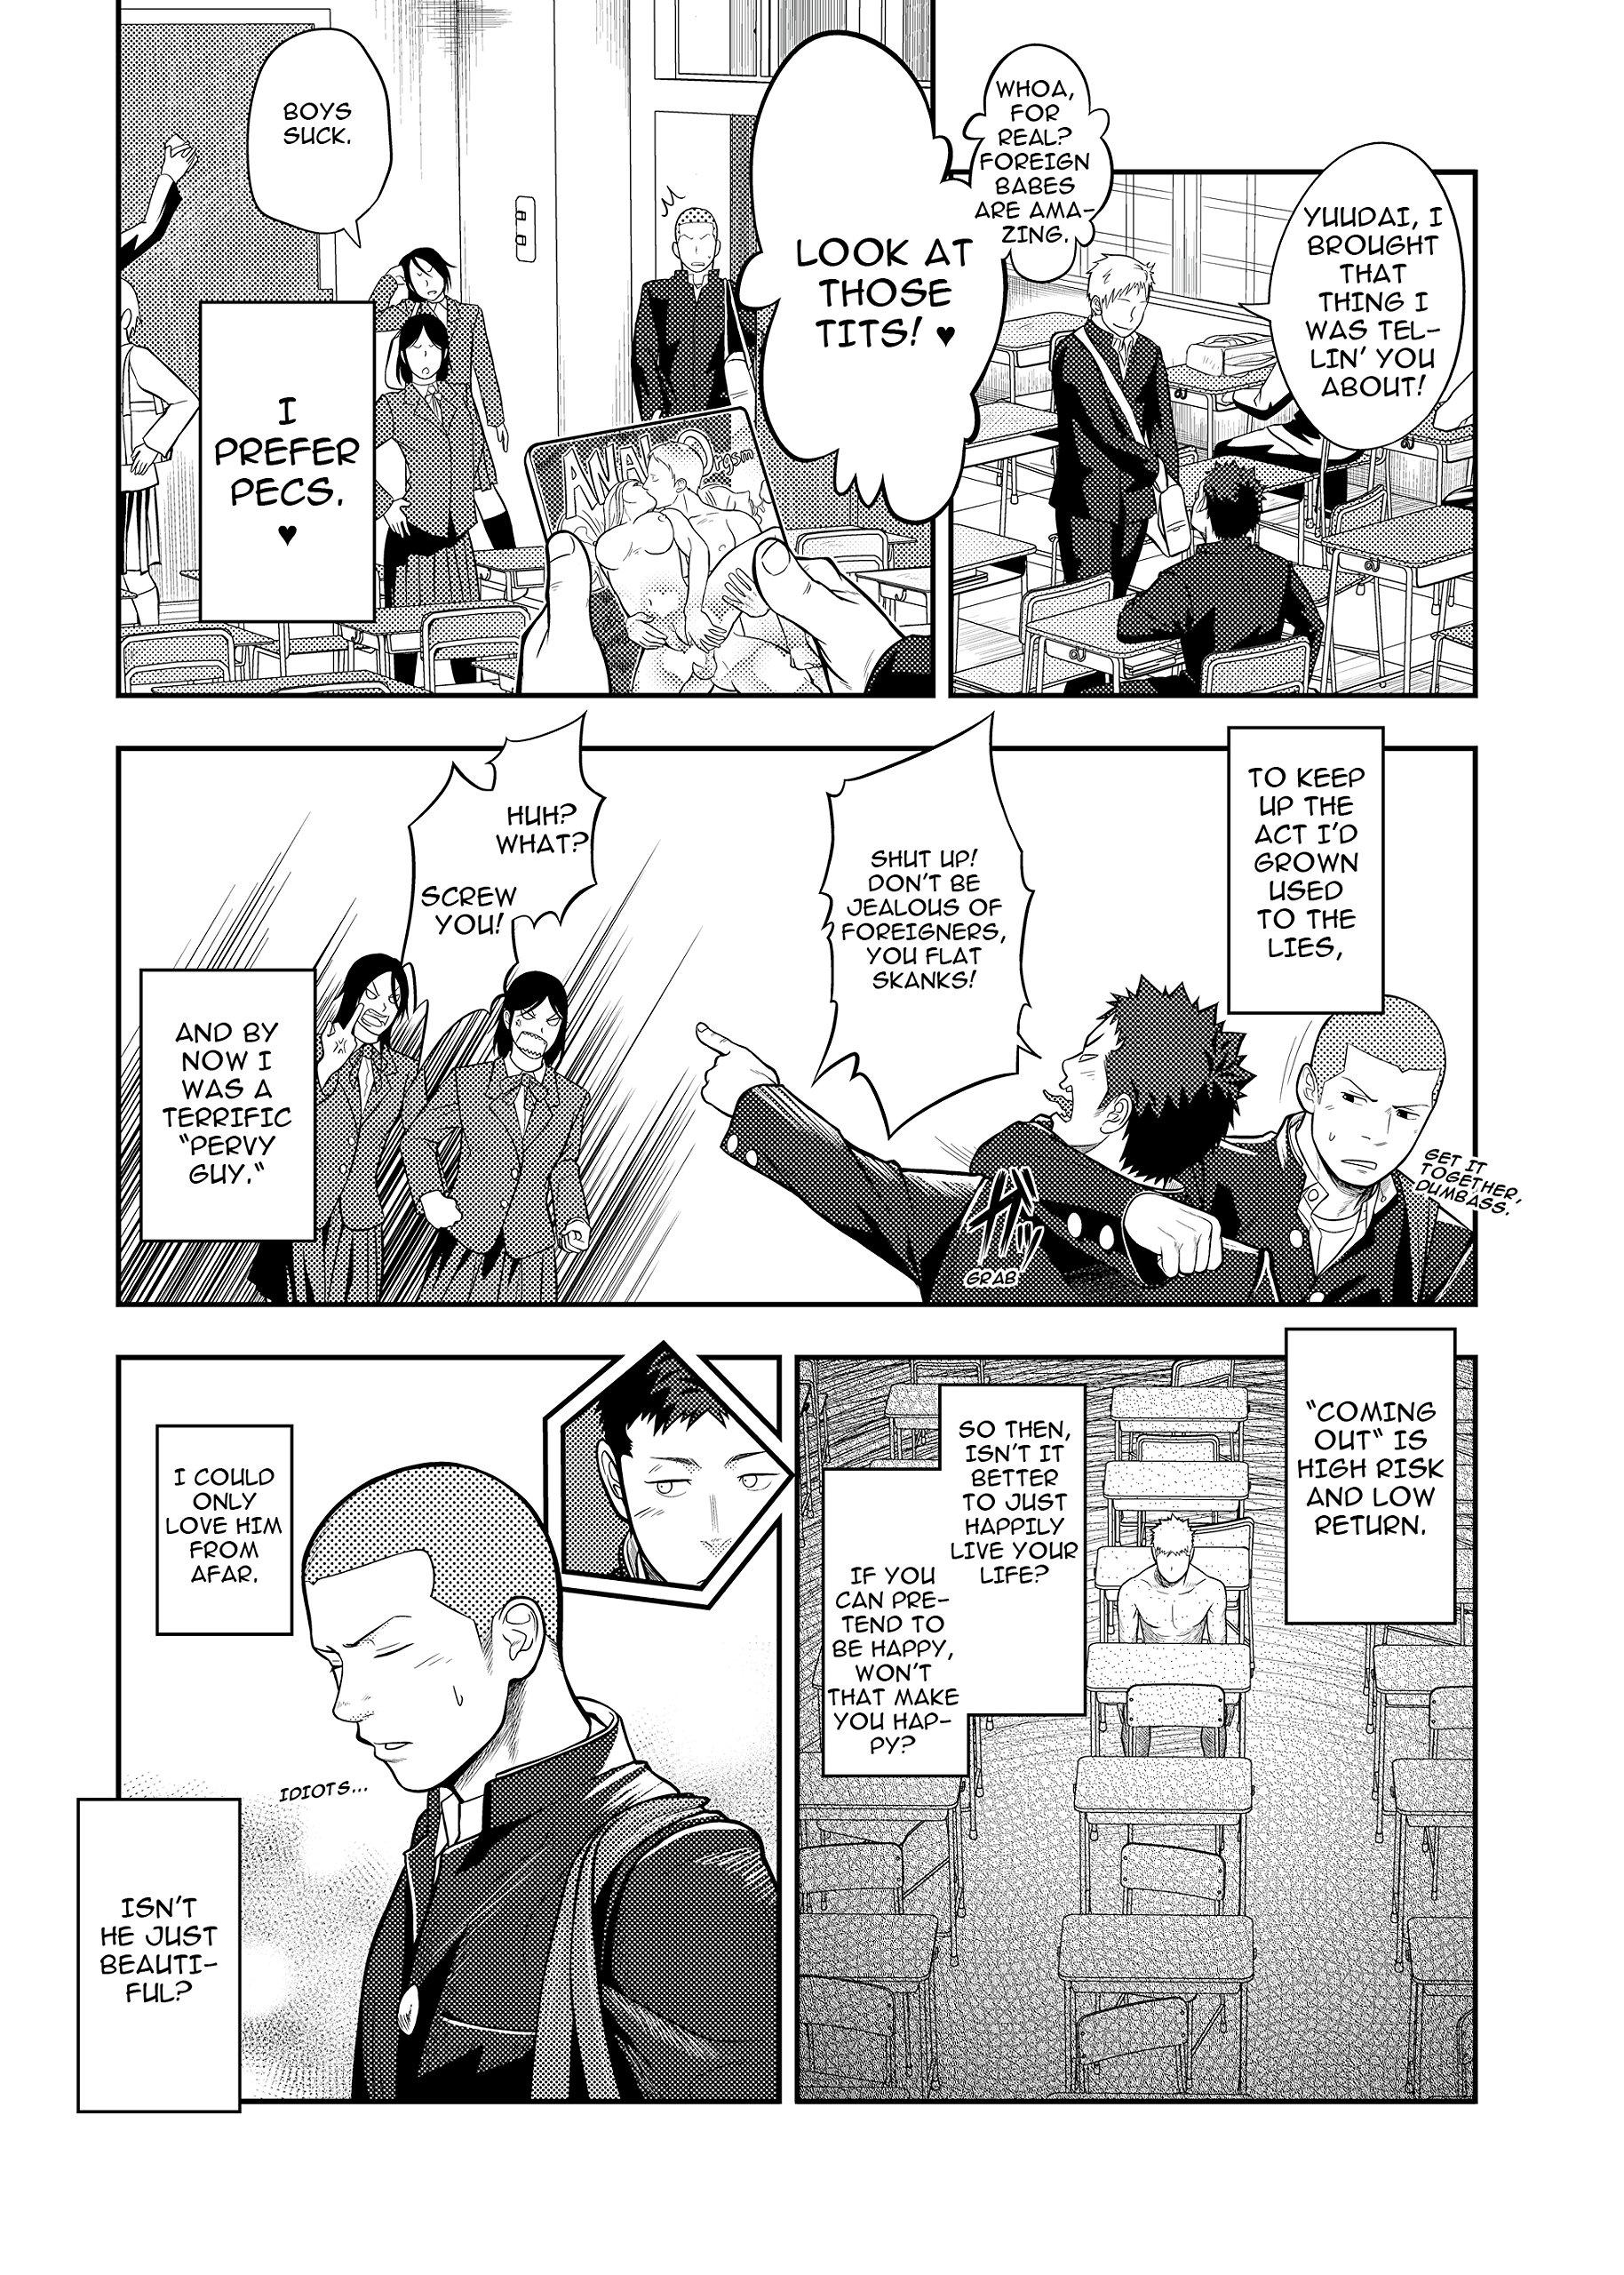 The Boy Who Cried Wolf Gay Manga Amazonde Mentaiko Itto Fremdsprachige Bucher